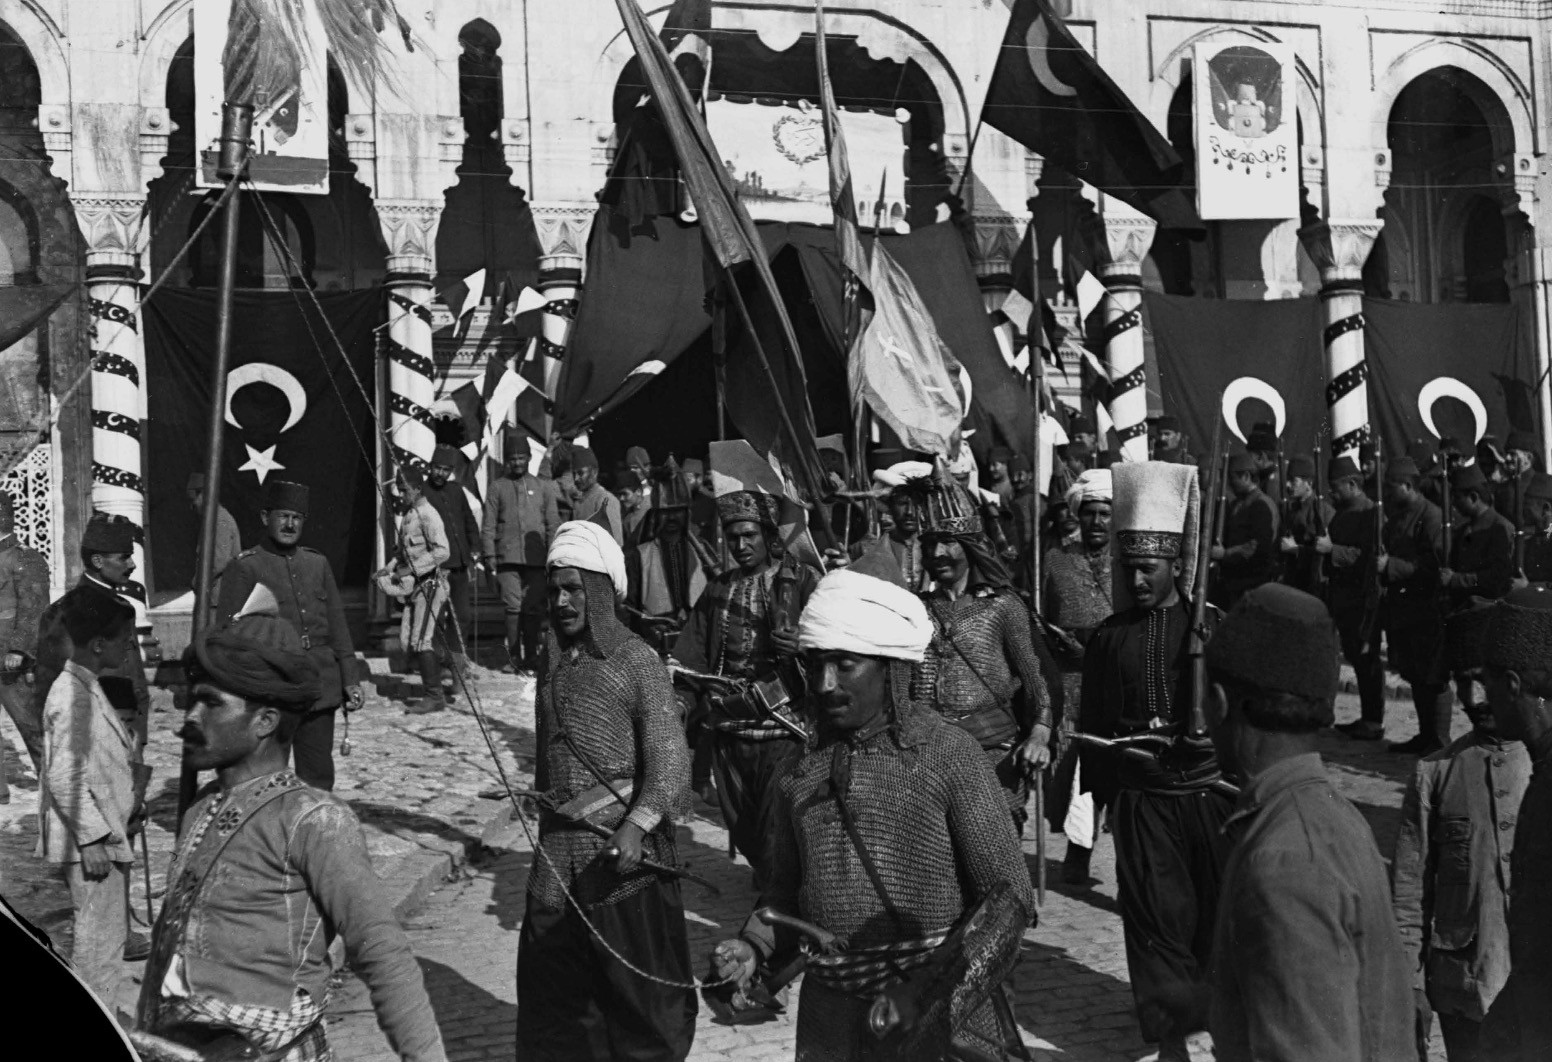 Ottoman Independence March, Taksim Barracks,  circa 1914.